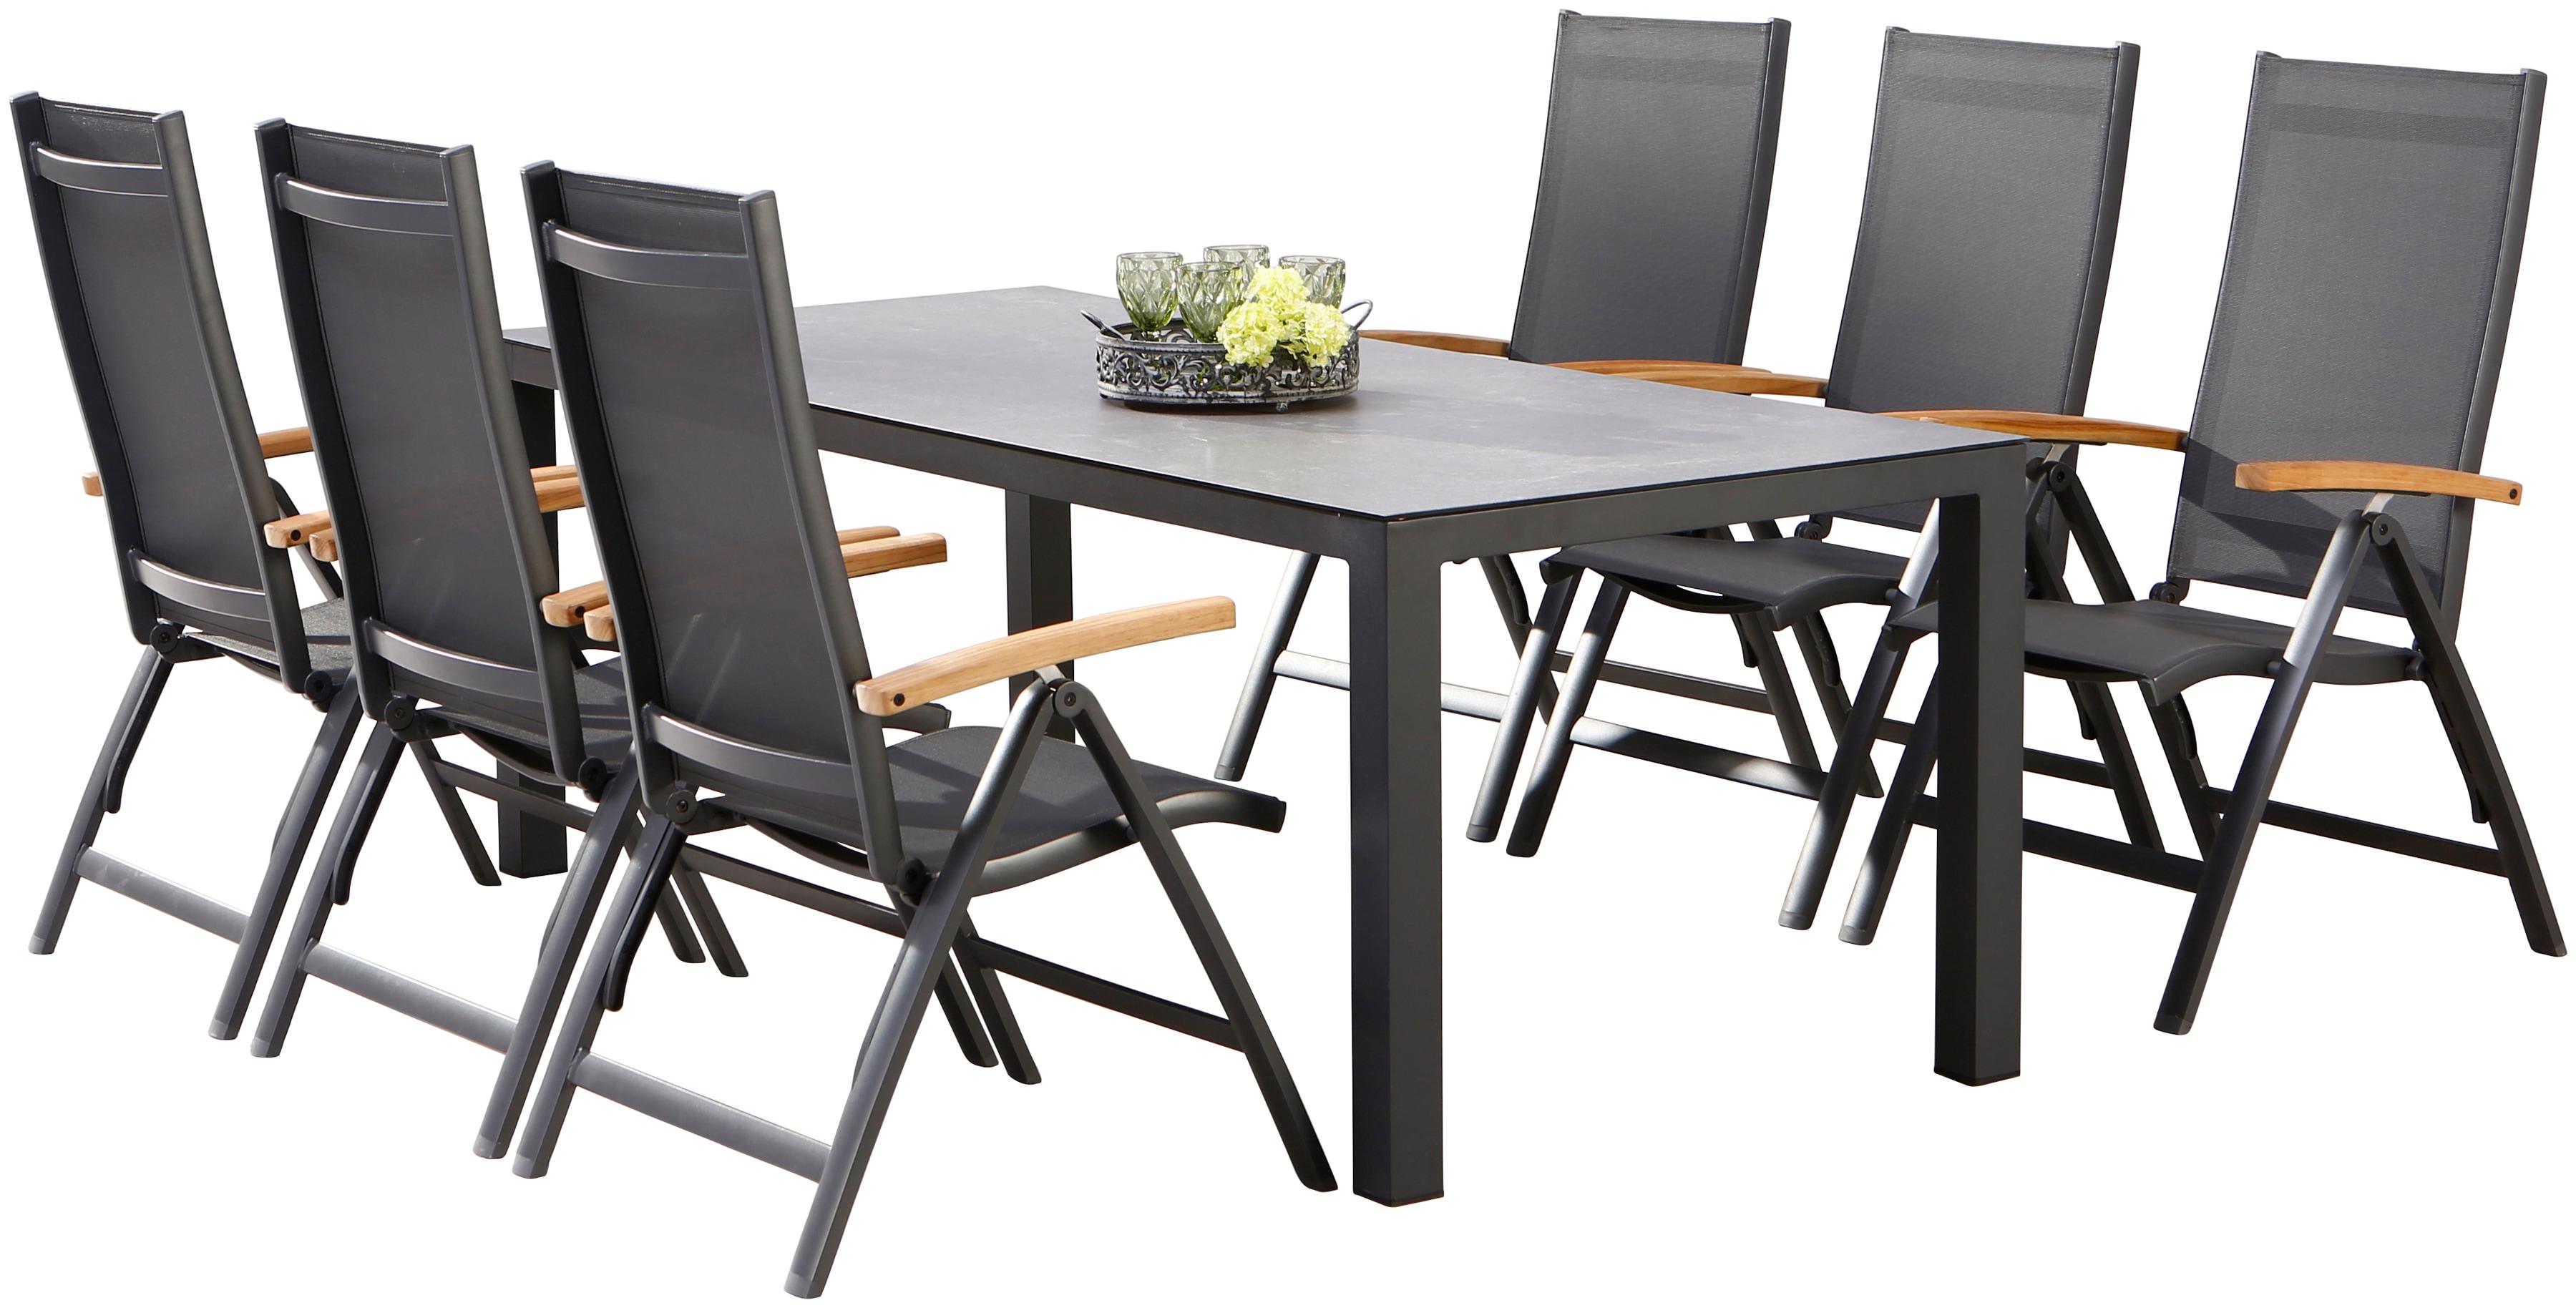 BEST Gartenmöbelset Cavalese 7-tlg 6 Sessel Tisch 210x90 cm Alumimium